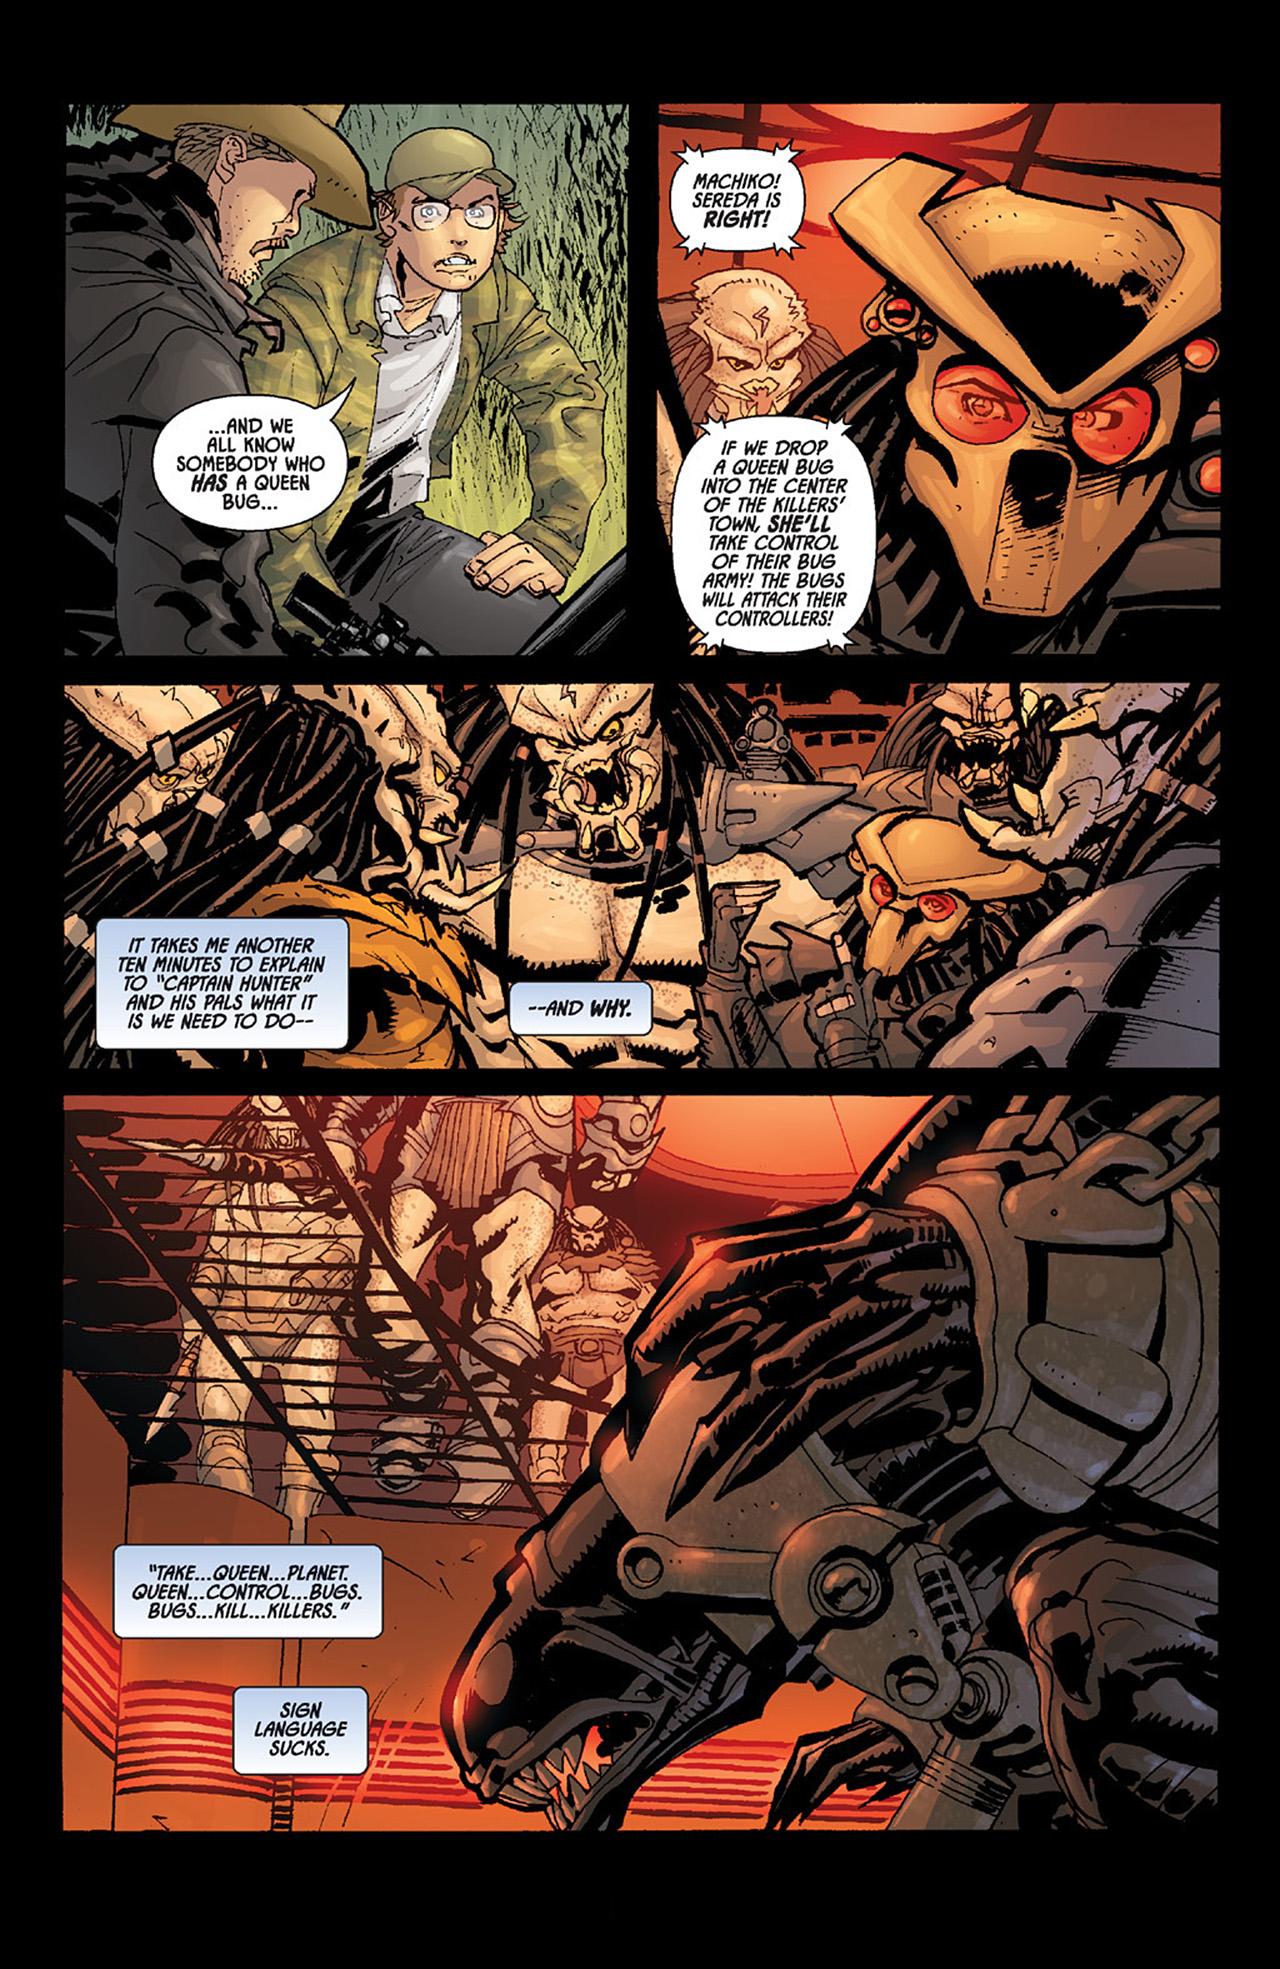 Read online Aliens vs. Predator: Three World War comic -  Issue #6 - 6